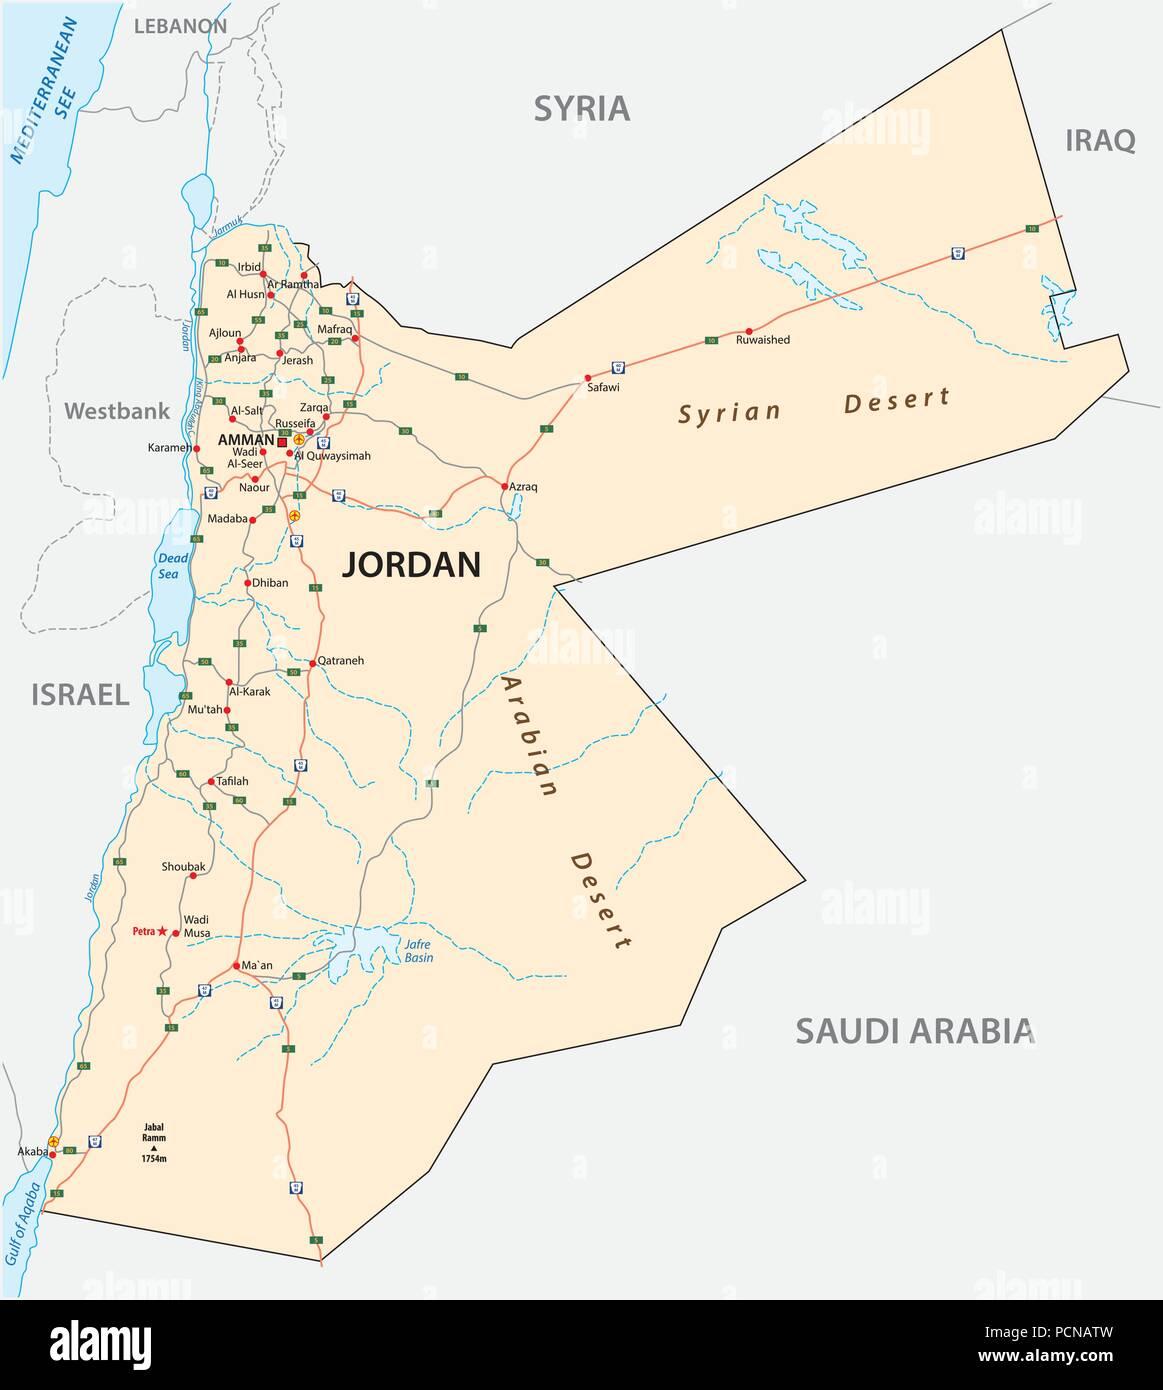 Kingdom of jordan road vector map stock vector art illustration kingdom of jordan road vector map publicscrutiny Choice Image